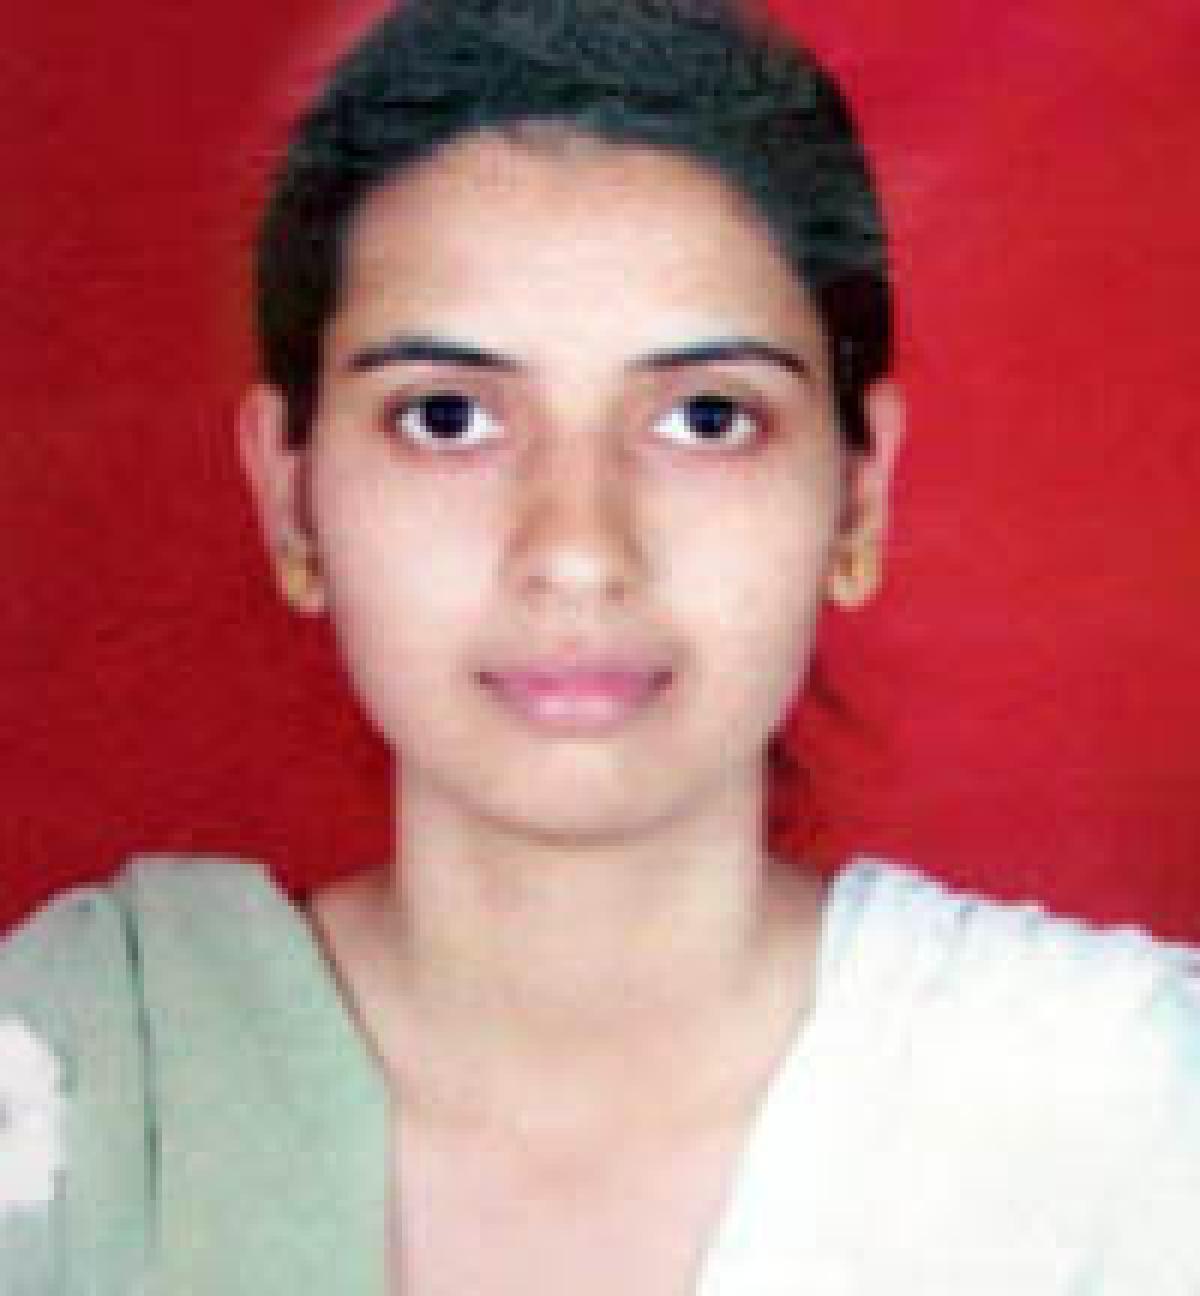 Preeti Rathi case: Welcome verdict on acid attack